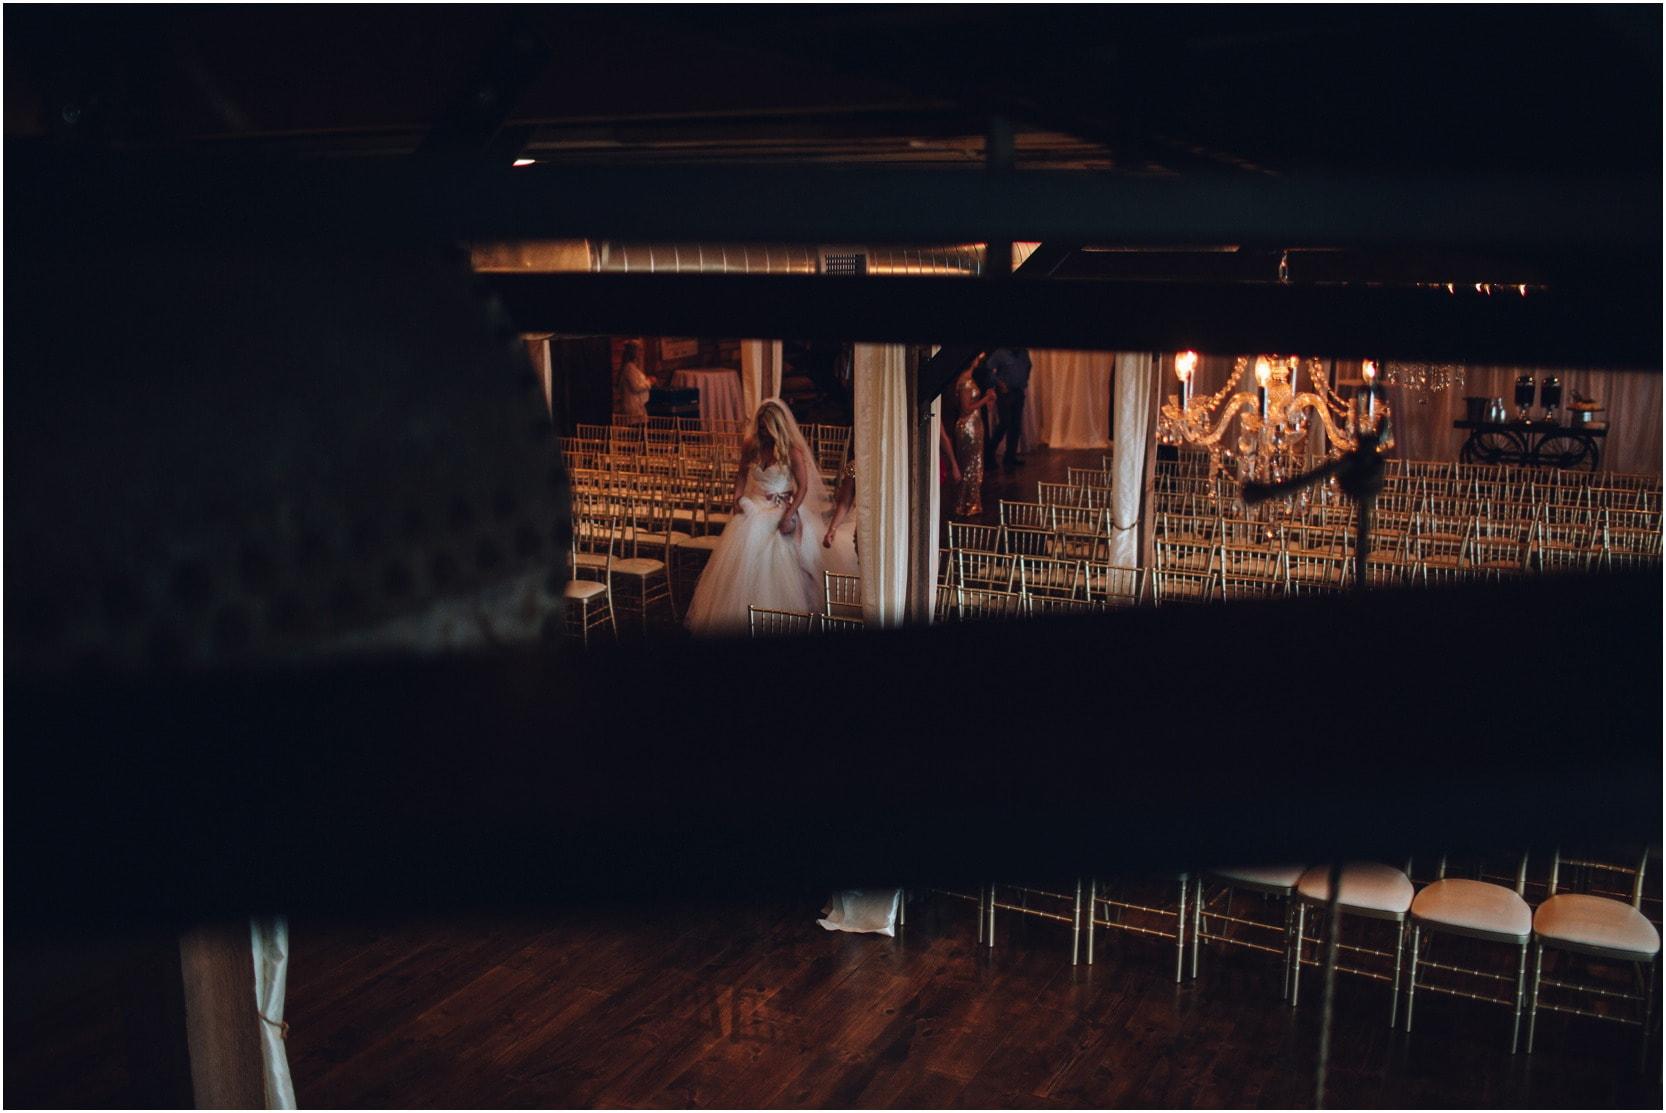 coderhillengburg_oklahoma_wedding__380_blogstomped